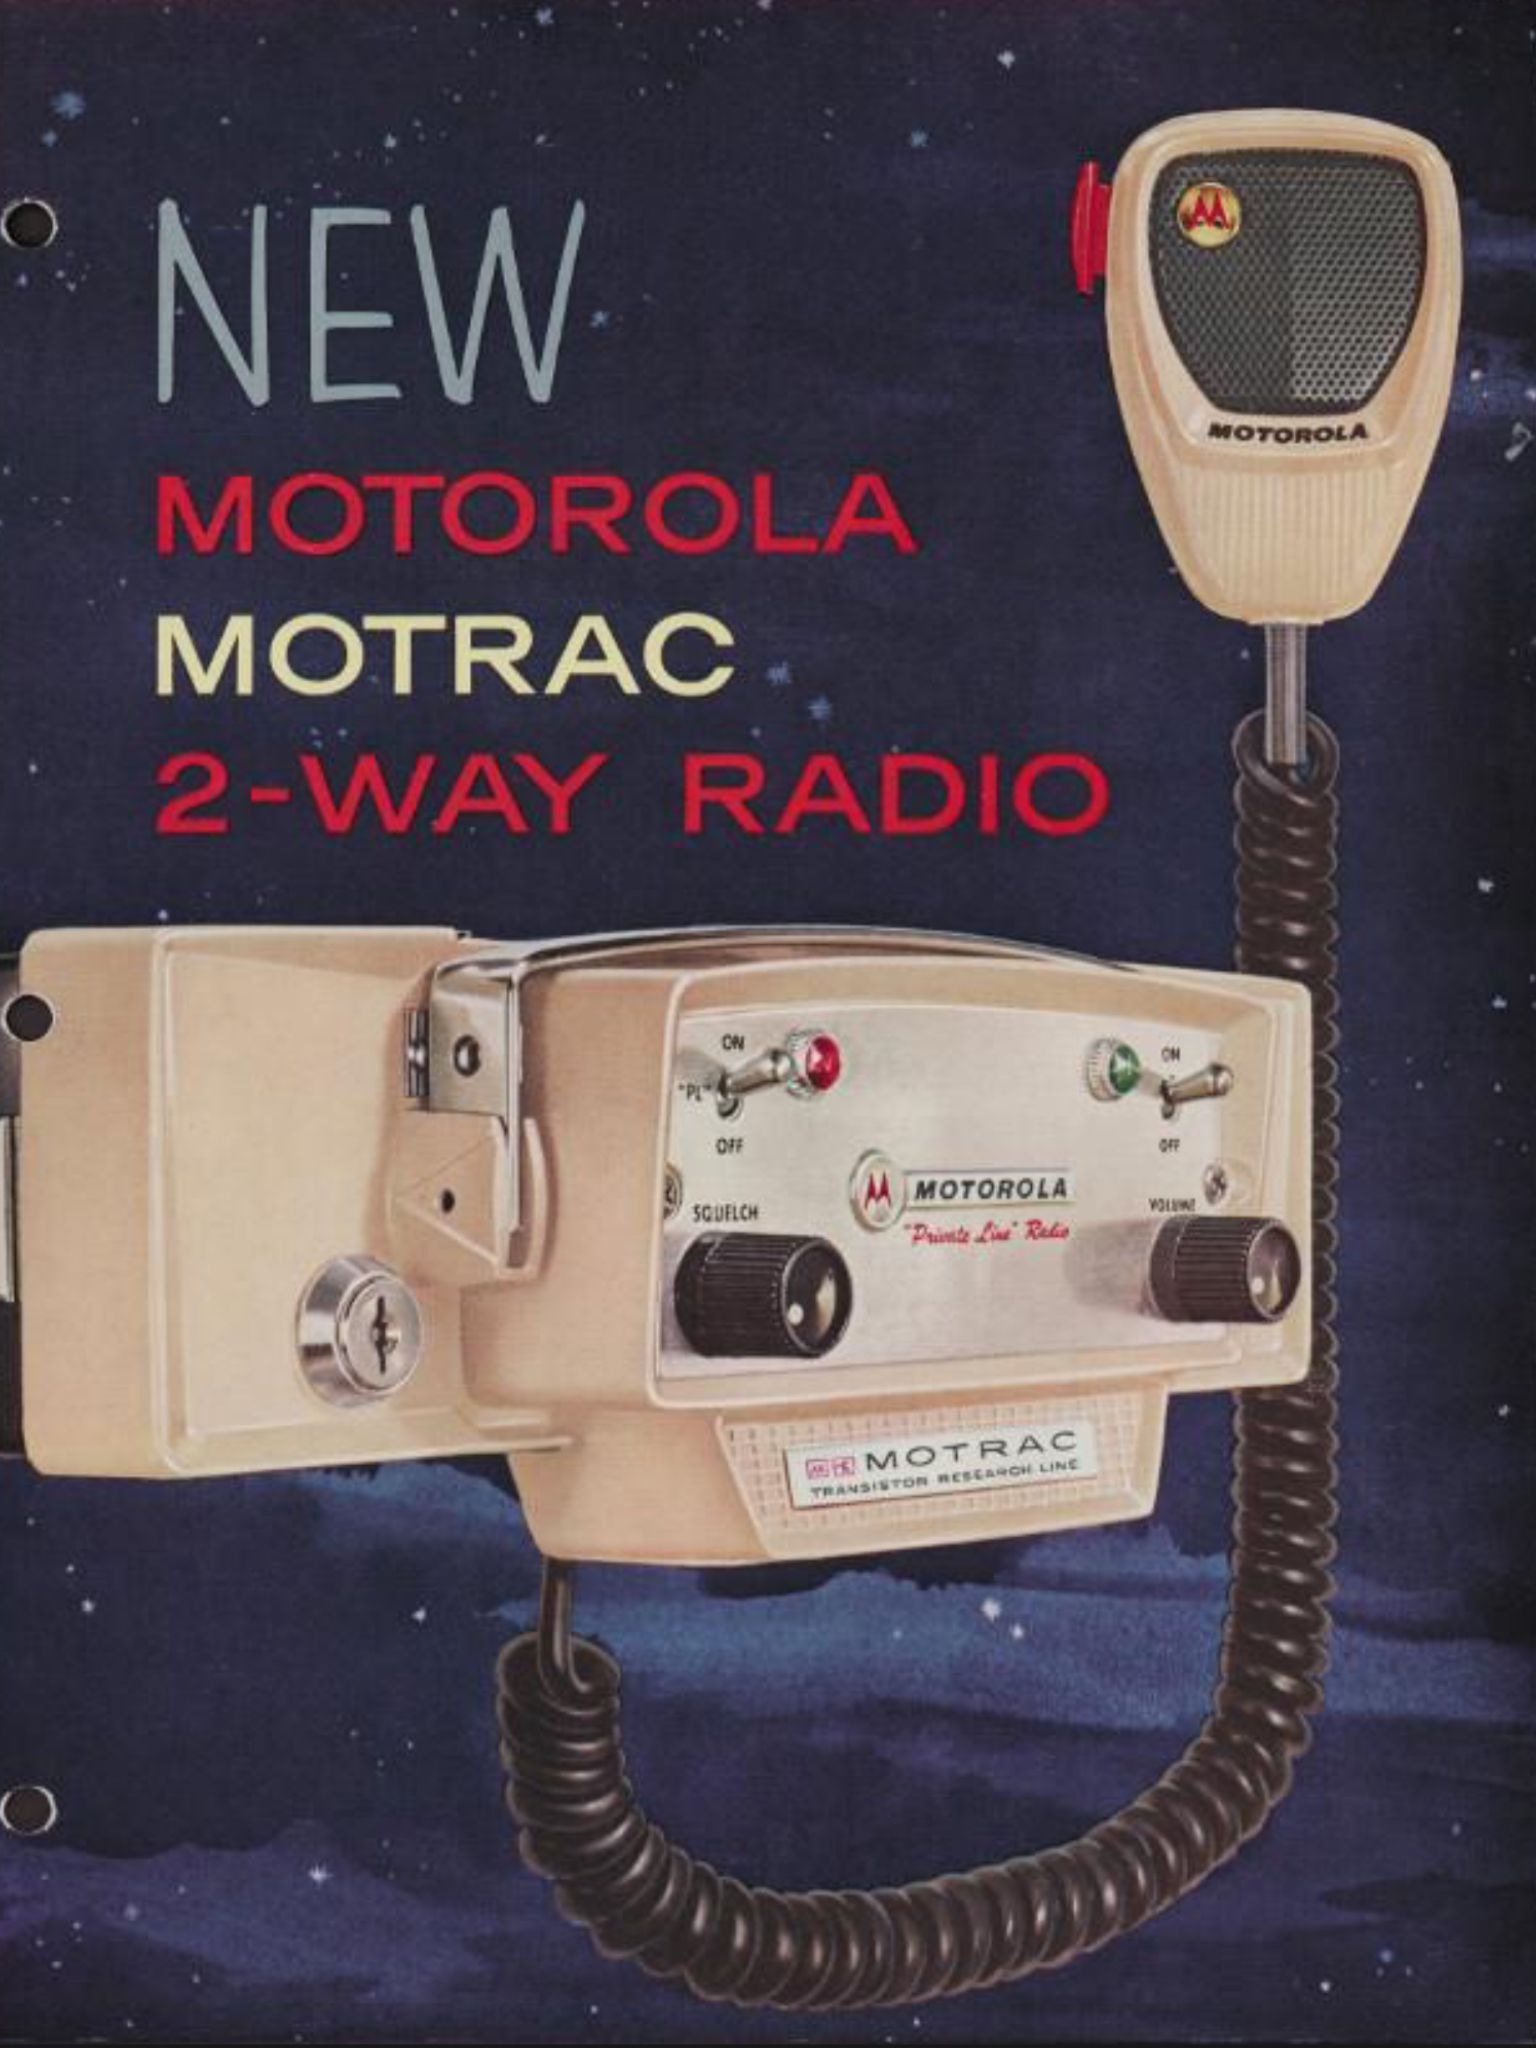 Vintage Motorola print add. It was once Hi Tech for public